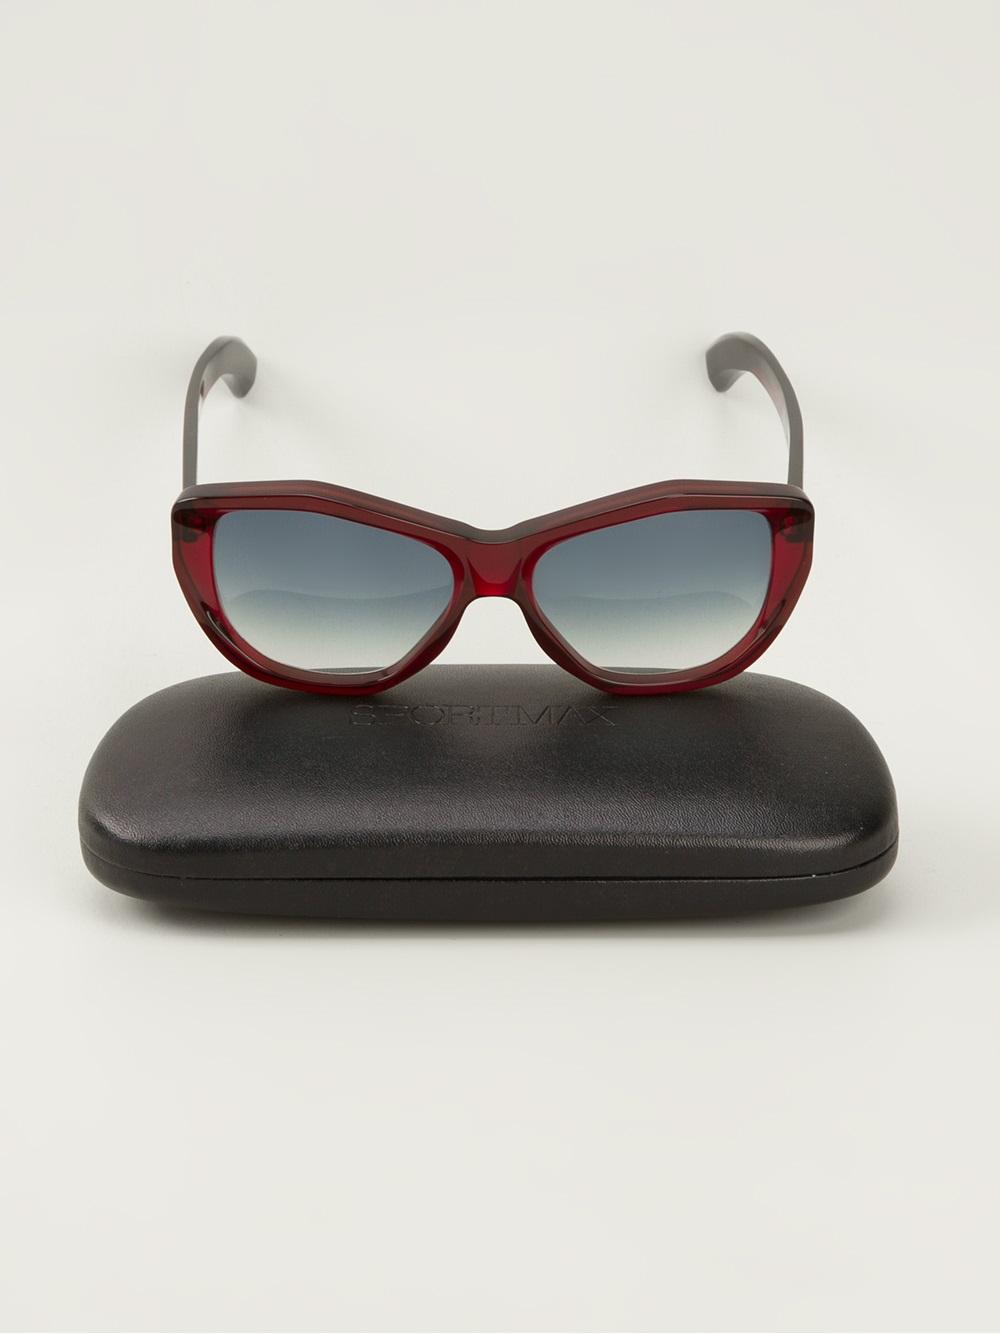 Sportmax Sculptured Cat Eye Sunglasses